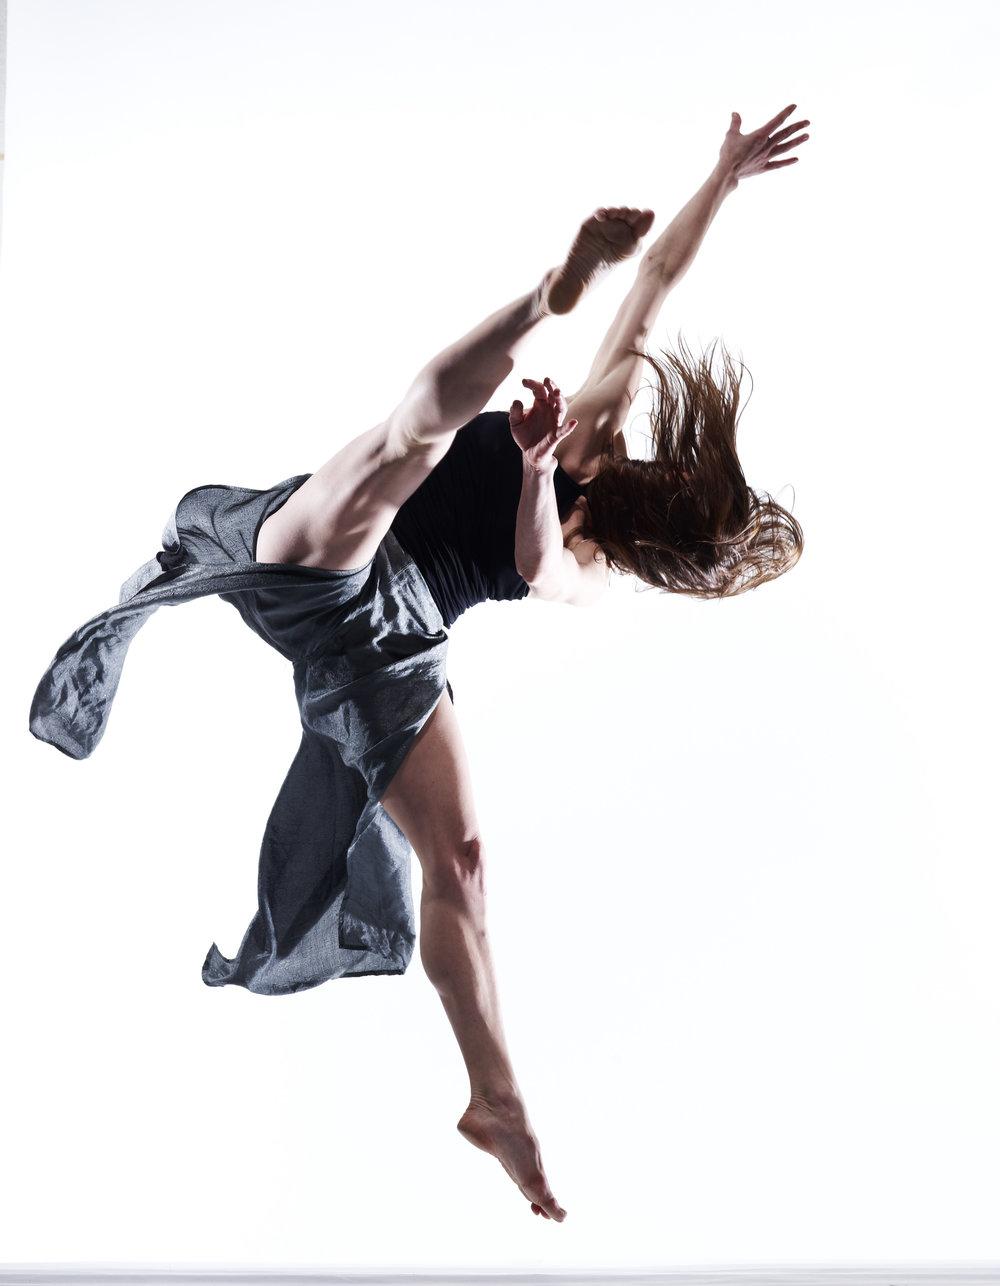 Bern_Ballet08_2-006063.jpg